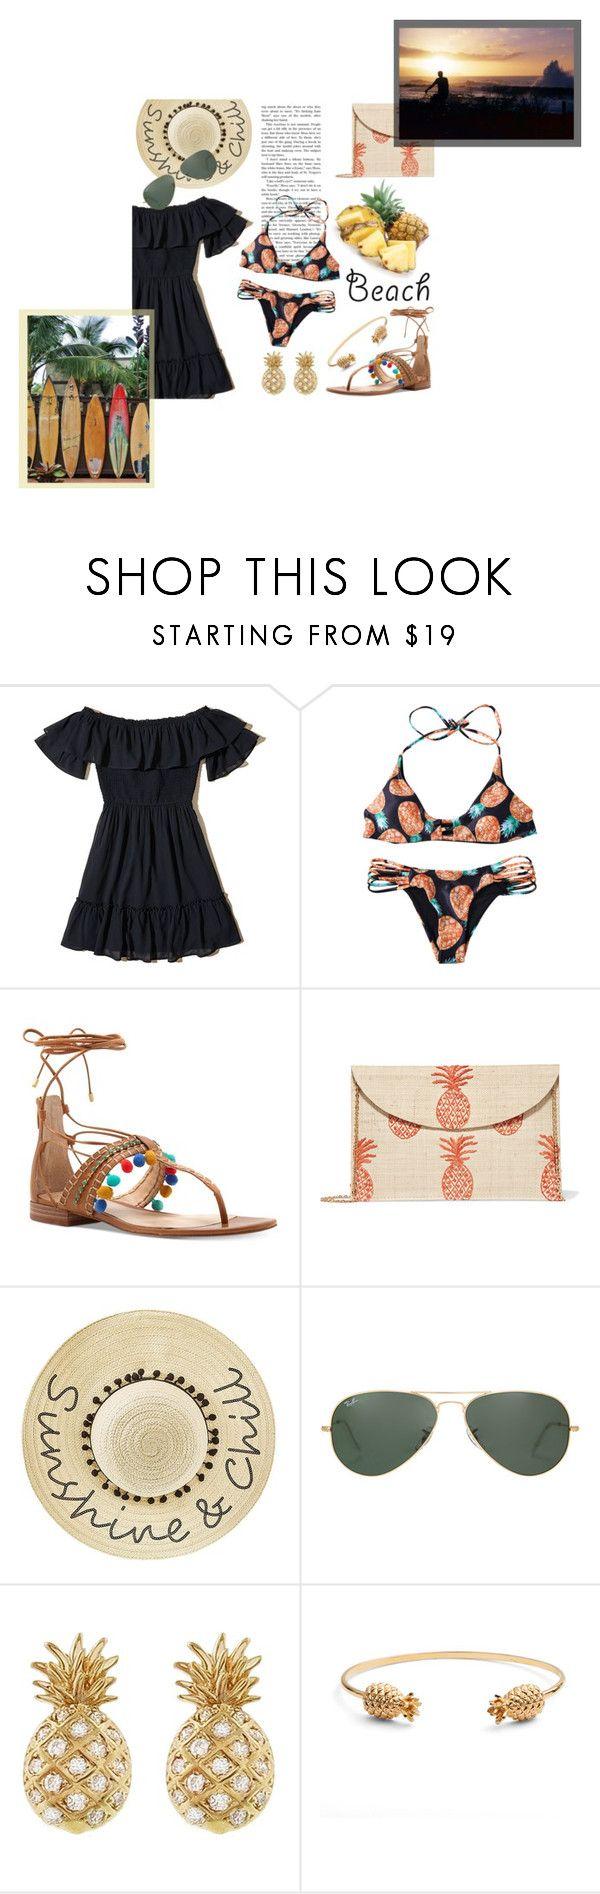 """Beachwear: Patterned Bikini + Pom Pom Sandals"" by random11-1 ❤ liked on Polyvore featuring Hollister Co., Vince Camuto, Kayu, SHAN, Betsey Johnson, Ray-Ban, Sydney Evan, Rachel Jackson and beachday"